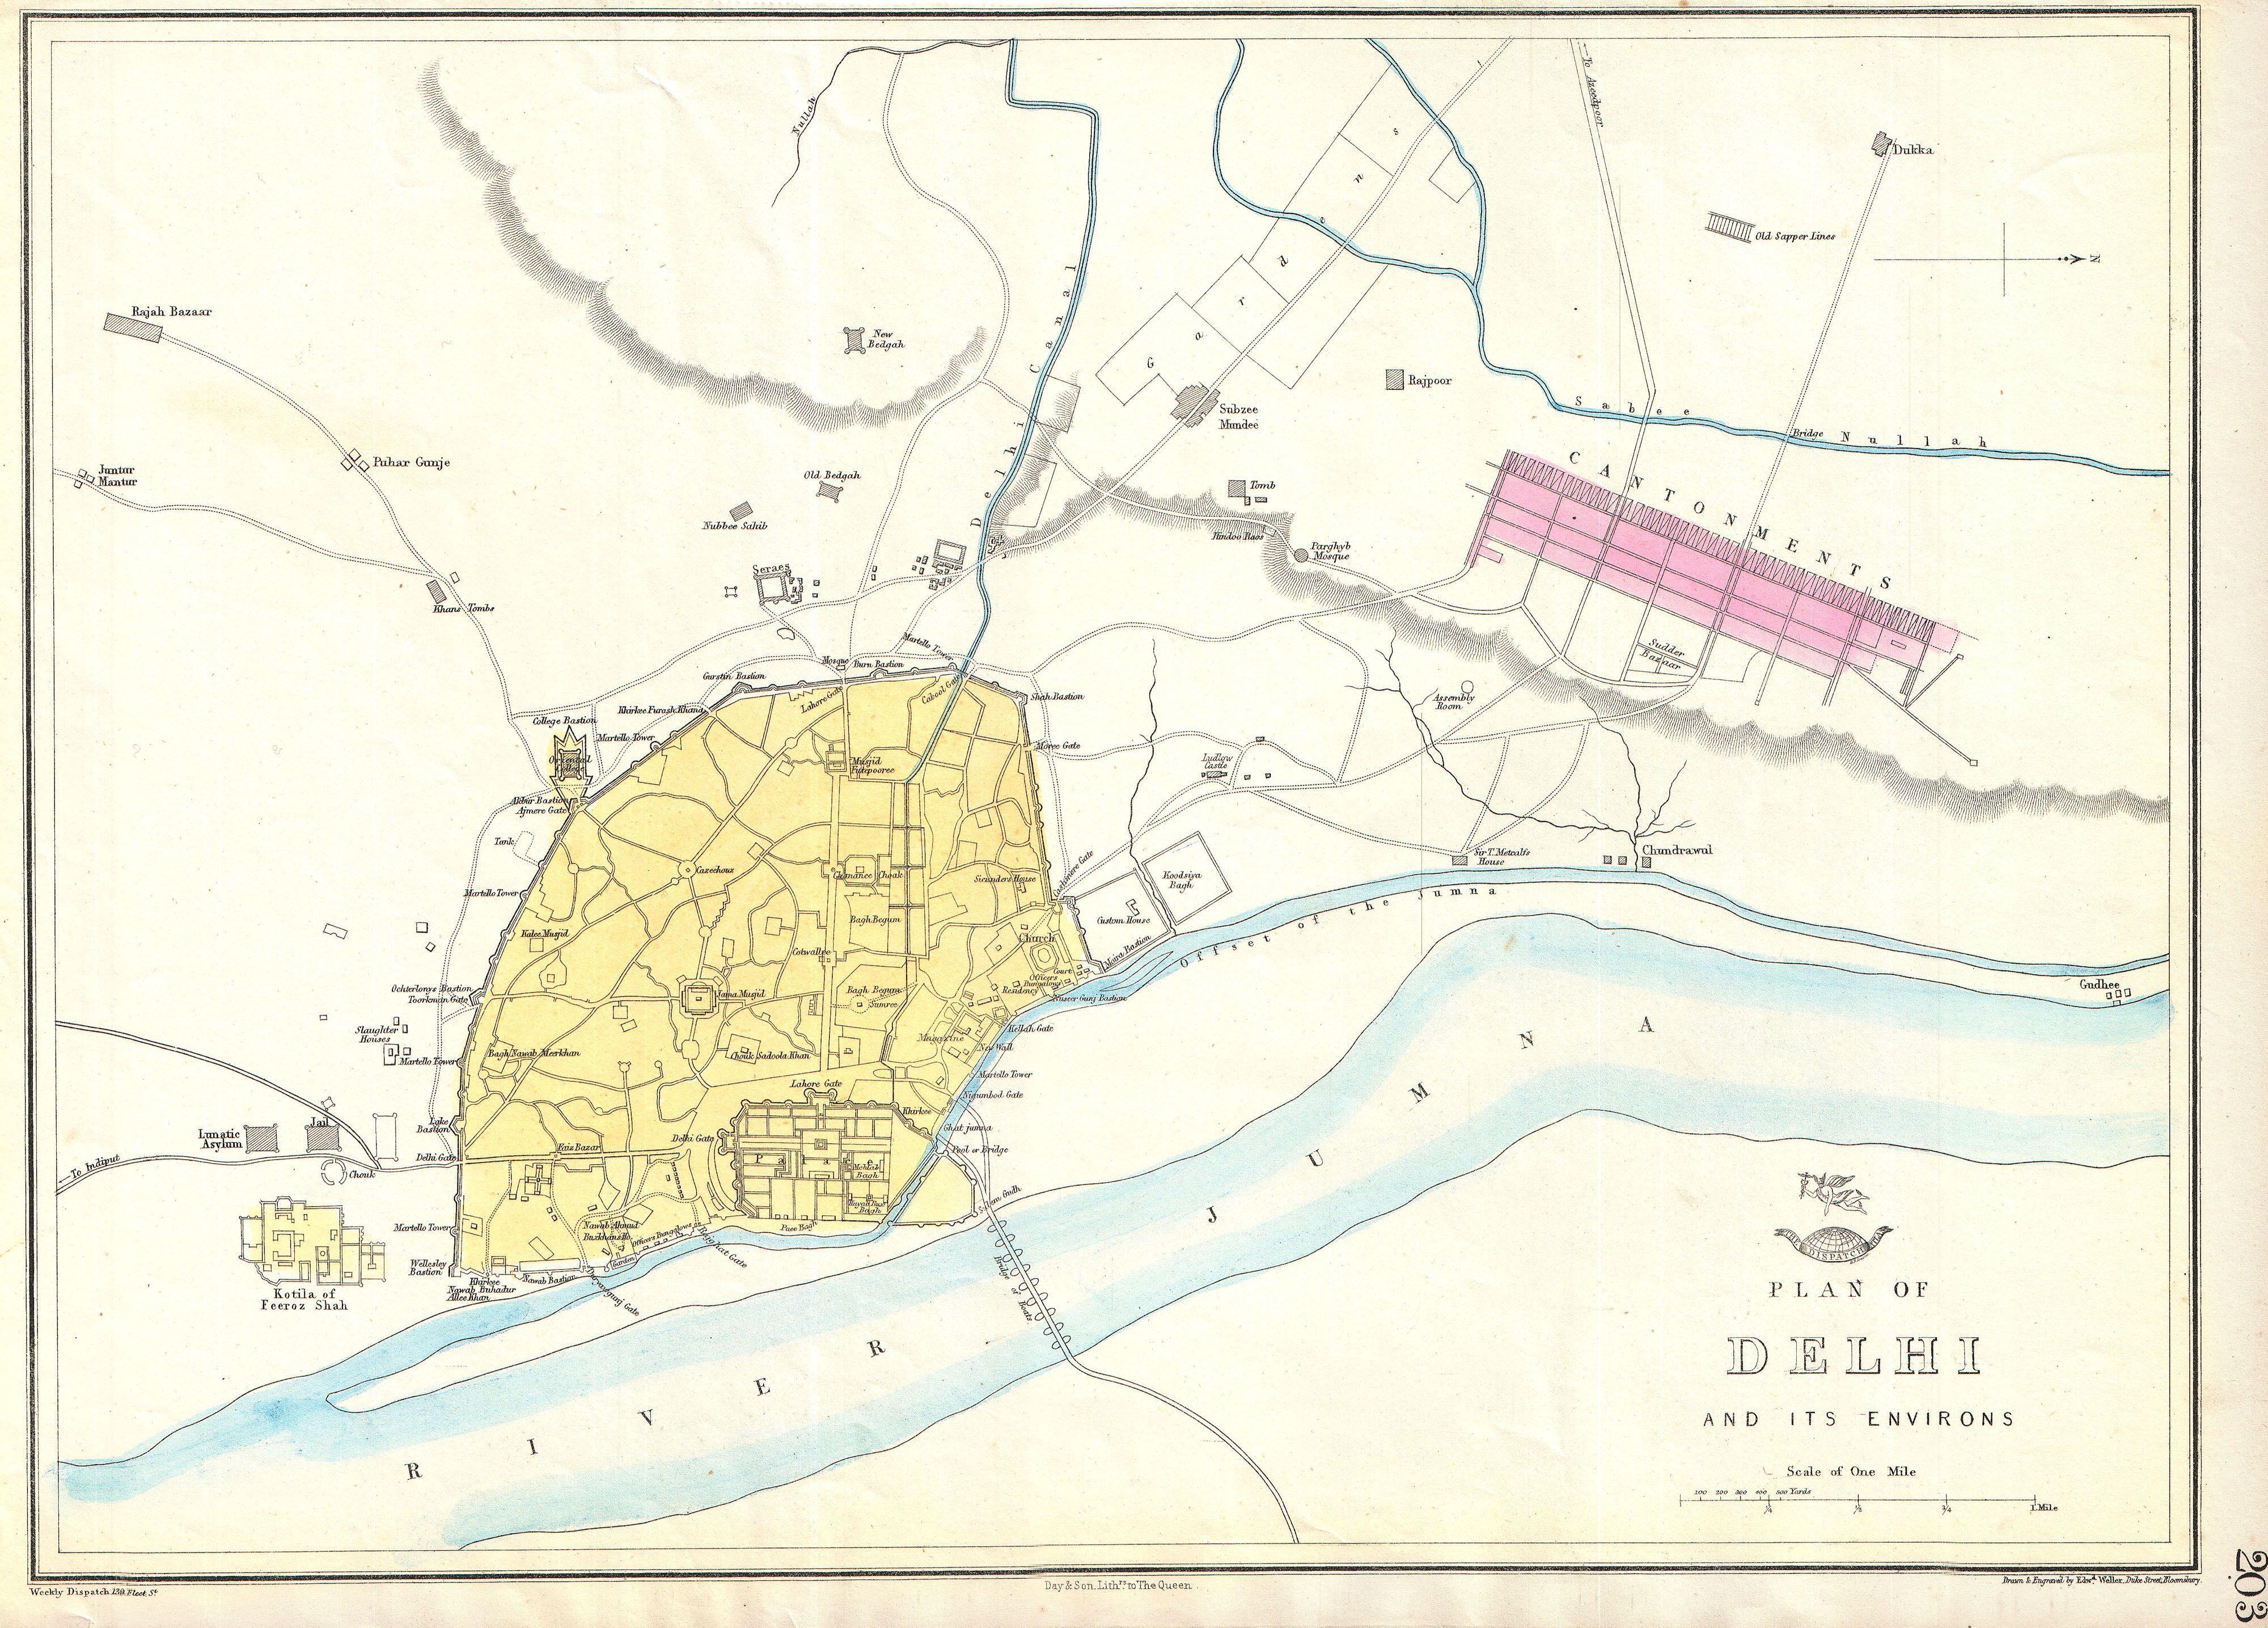 File:1863 Dispatch Atlas Map of Delhi, India - Geographicus ... on istanbul turkey map, mexico city map, delhi airport map, calcutta map, hindu kush map, moscow map, islamabad map, delhi india poster, beijing china map, shanghai map, barcelona spain map, lisbon map, dhaka bangladesh map, karachi map, kolkata map, lahore pakistan map, manila map, kashmir map, kathmandu nepal map, guangzhou china map,